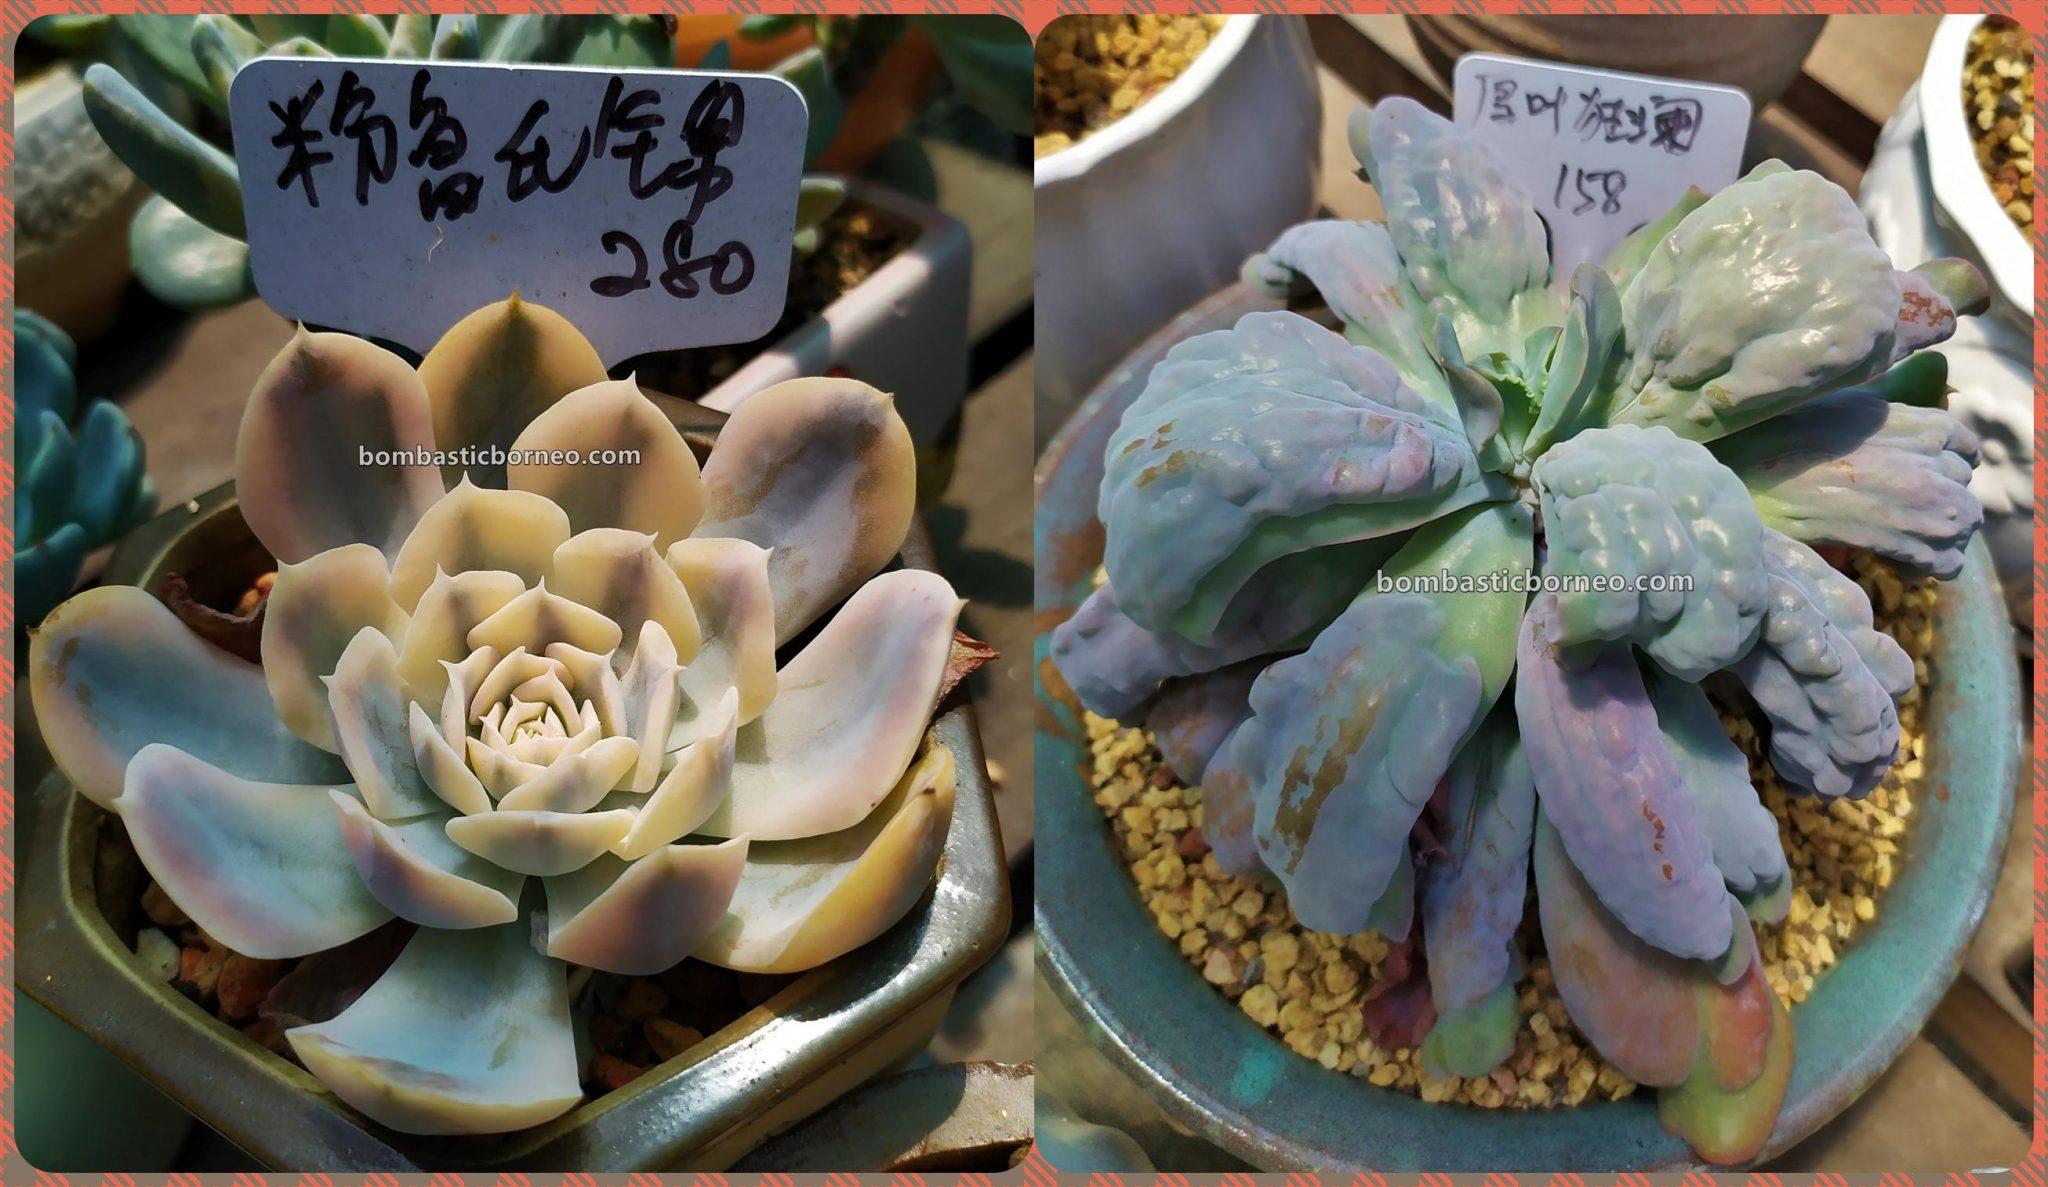 LS Succulent Garden, cacti, Tanaman Kaktus, botany, flora, nature, Discover Miri City, exploration, Tourism, tourist attraction, Travel Guide, Trans Borneo, 穿越婆罗洲游踪, 马来西亚砂拉越, 美里旅游景点,